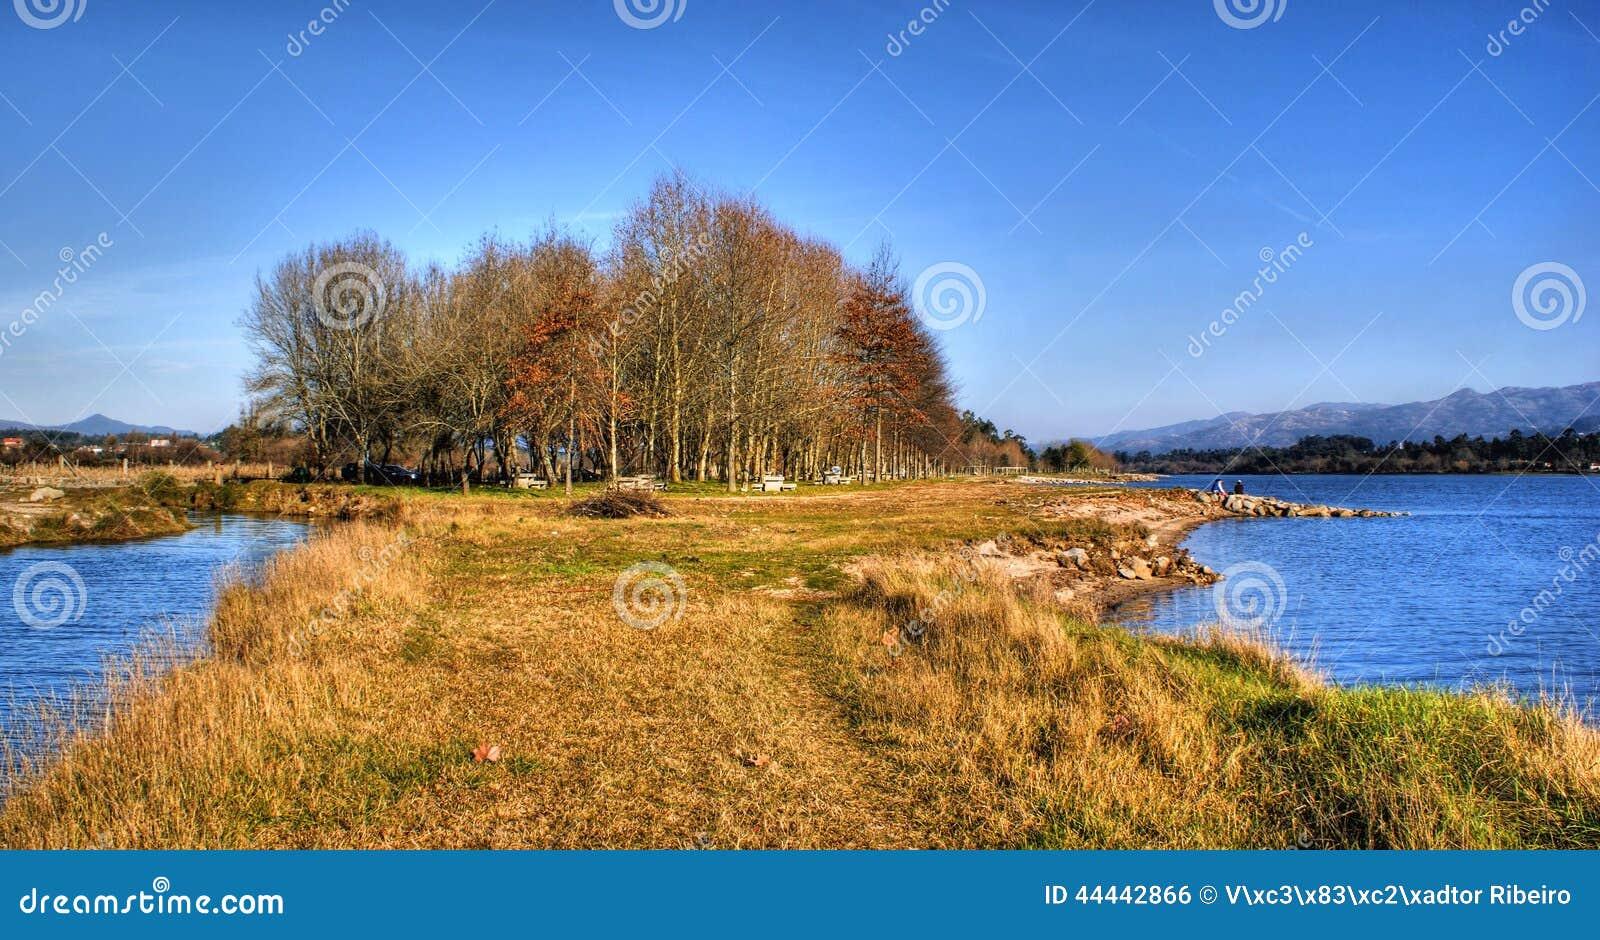 Scenary κοντά στον ποταμό στην αγροτική περιοχή